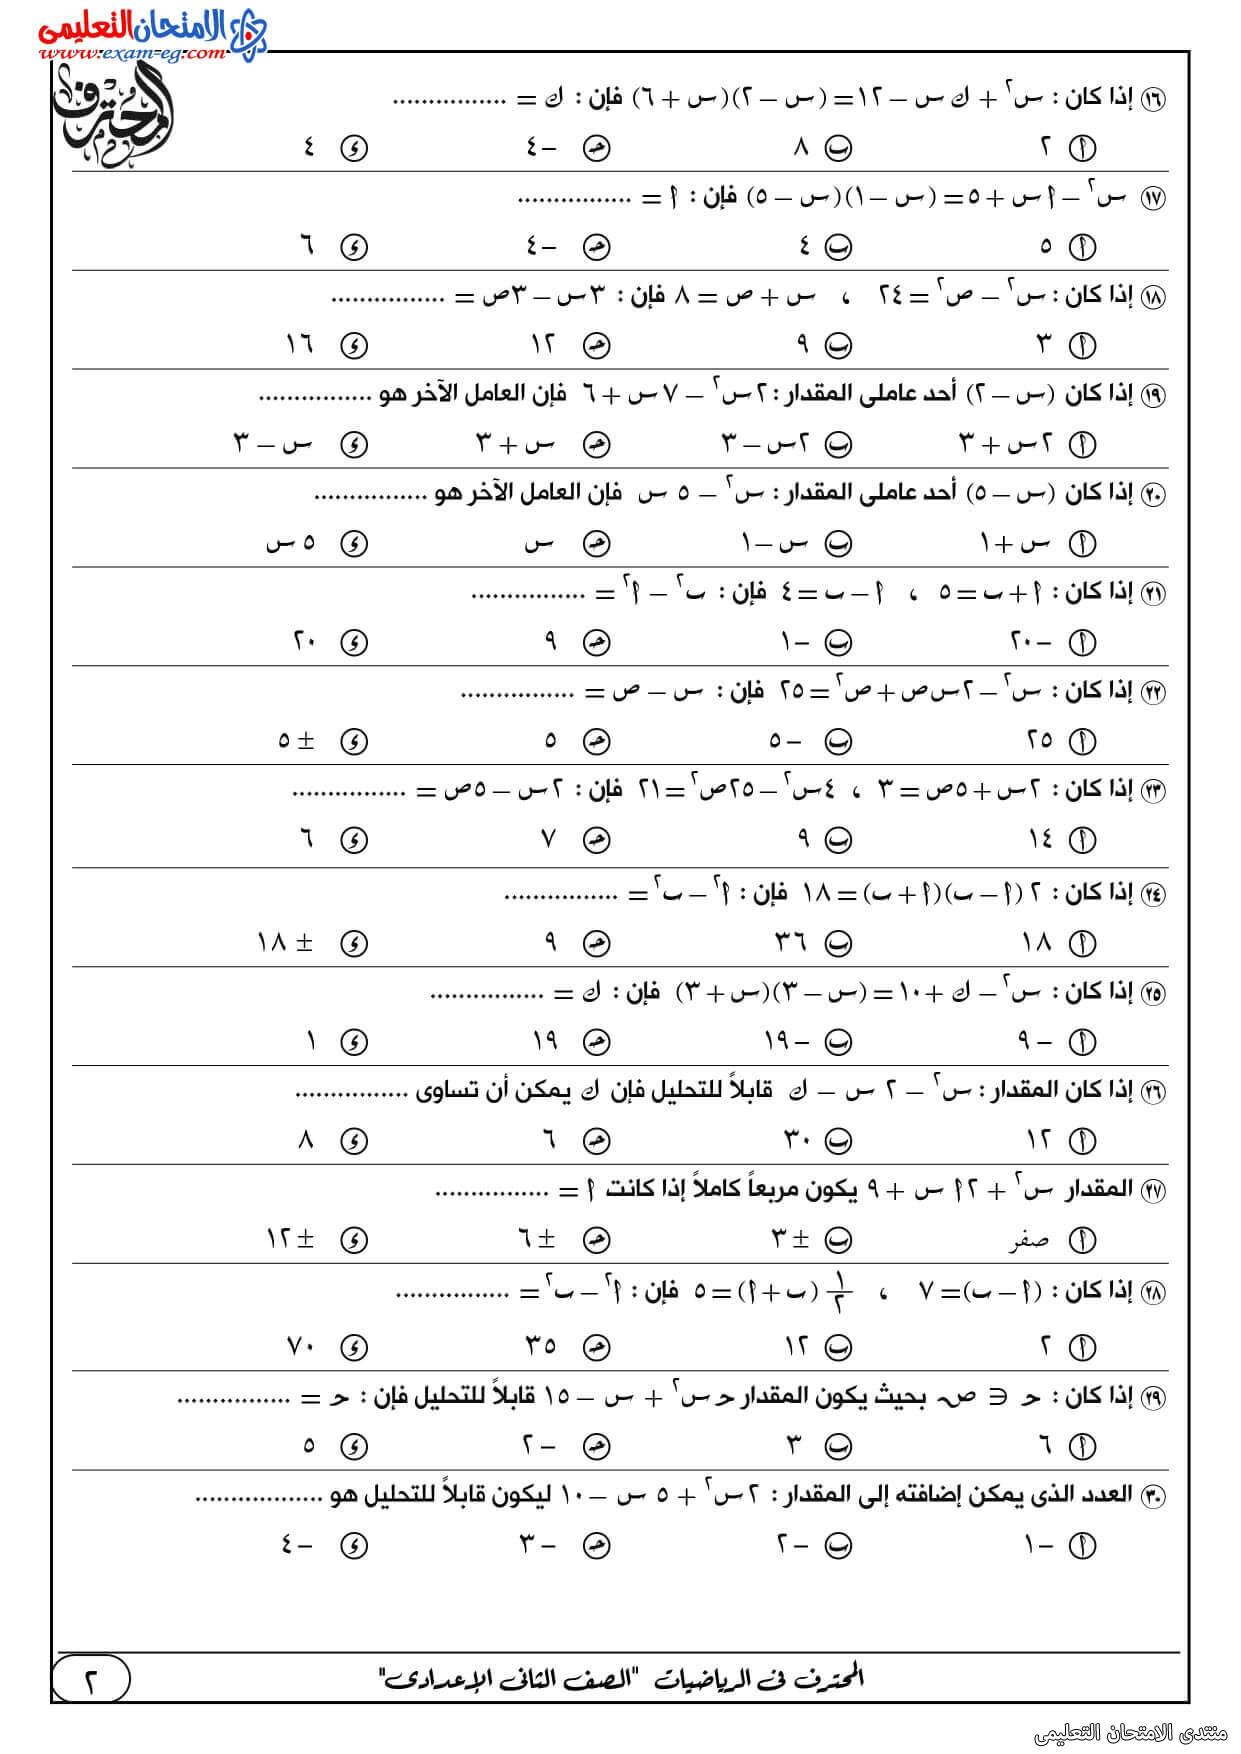 exam-eg.com_161660422405722.jpg